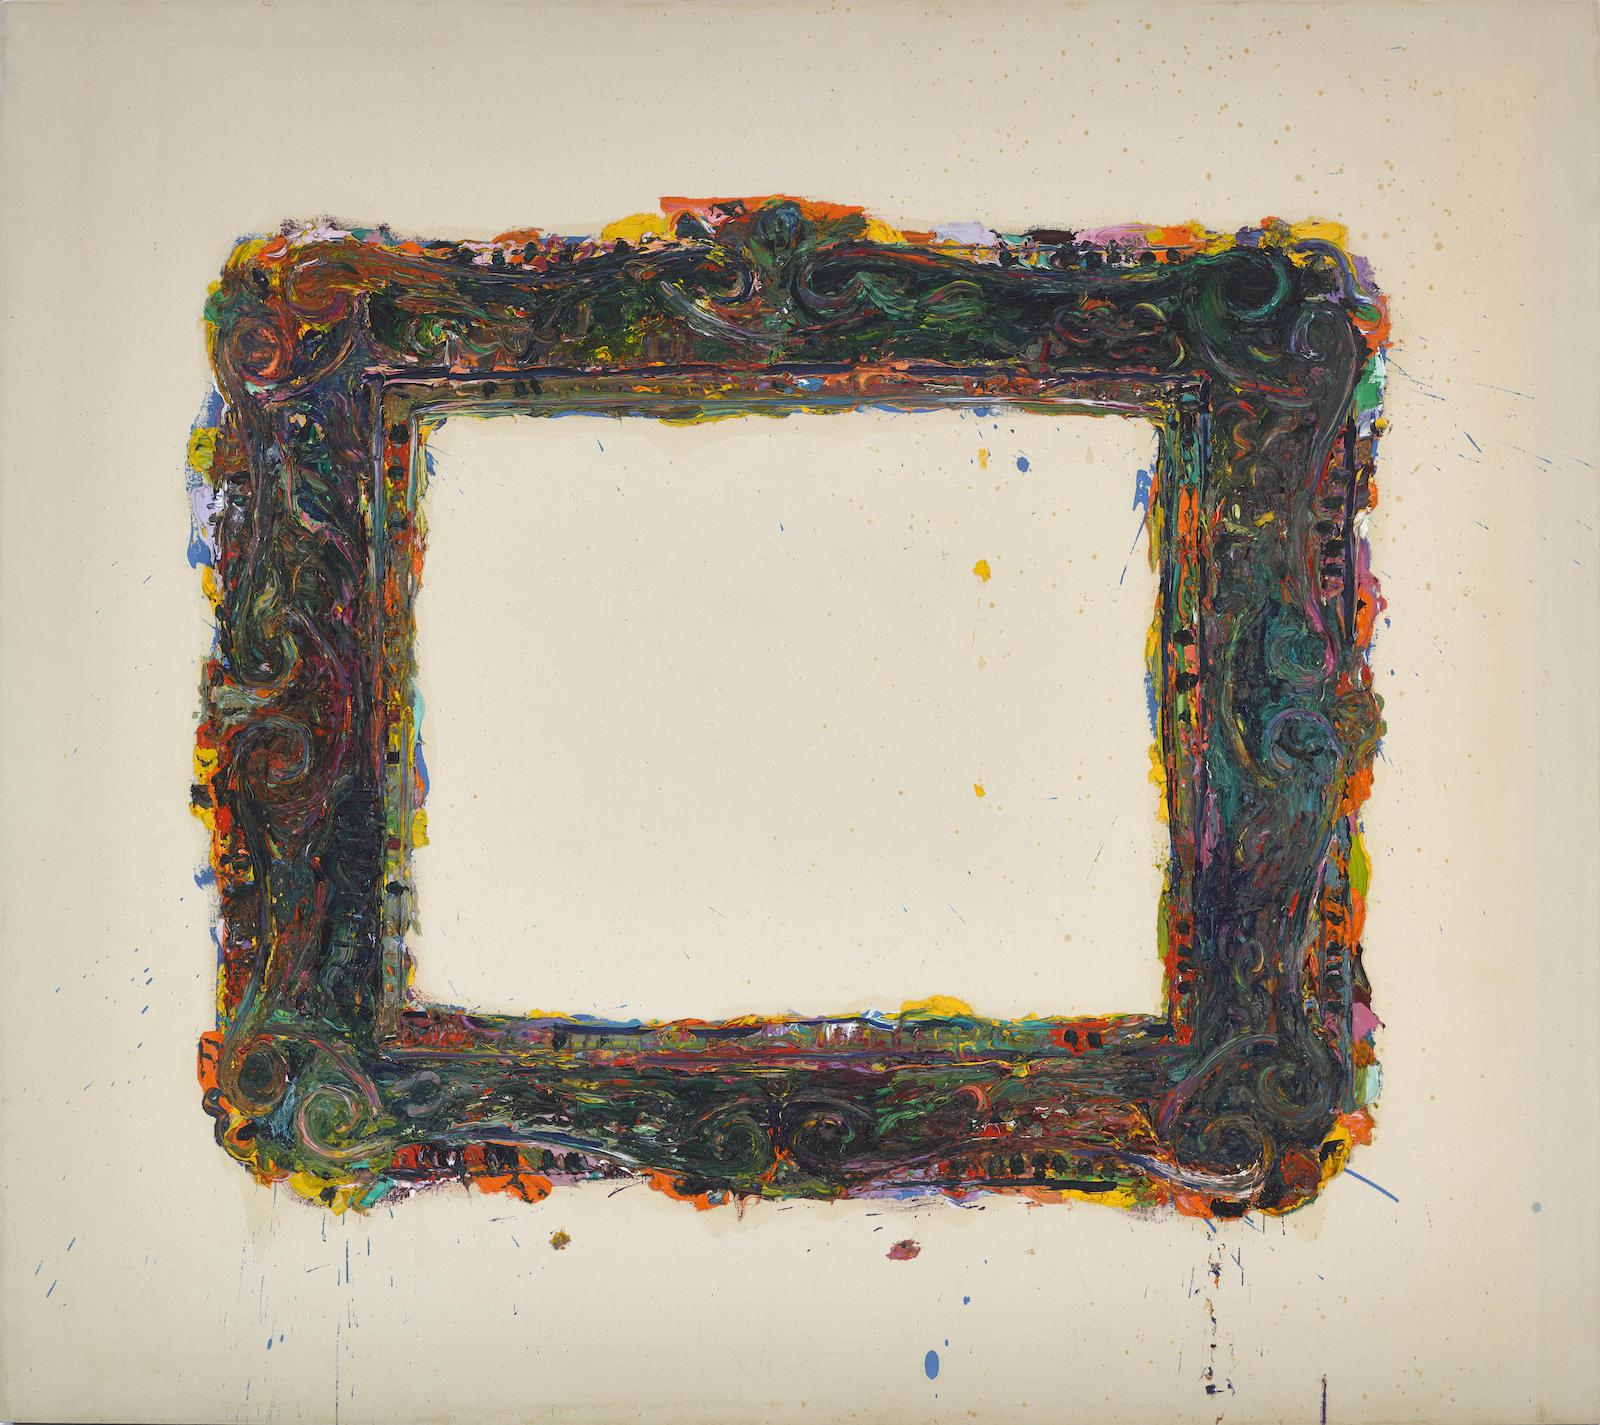 Robert Arneson-Frame Painting #7 (Soutine)-1968